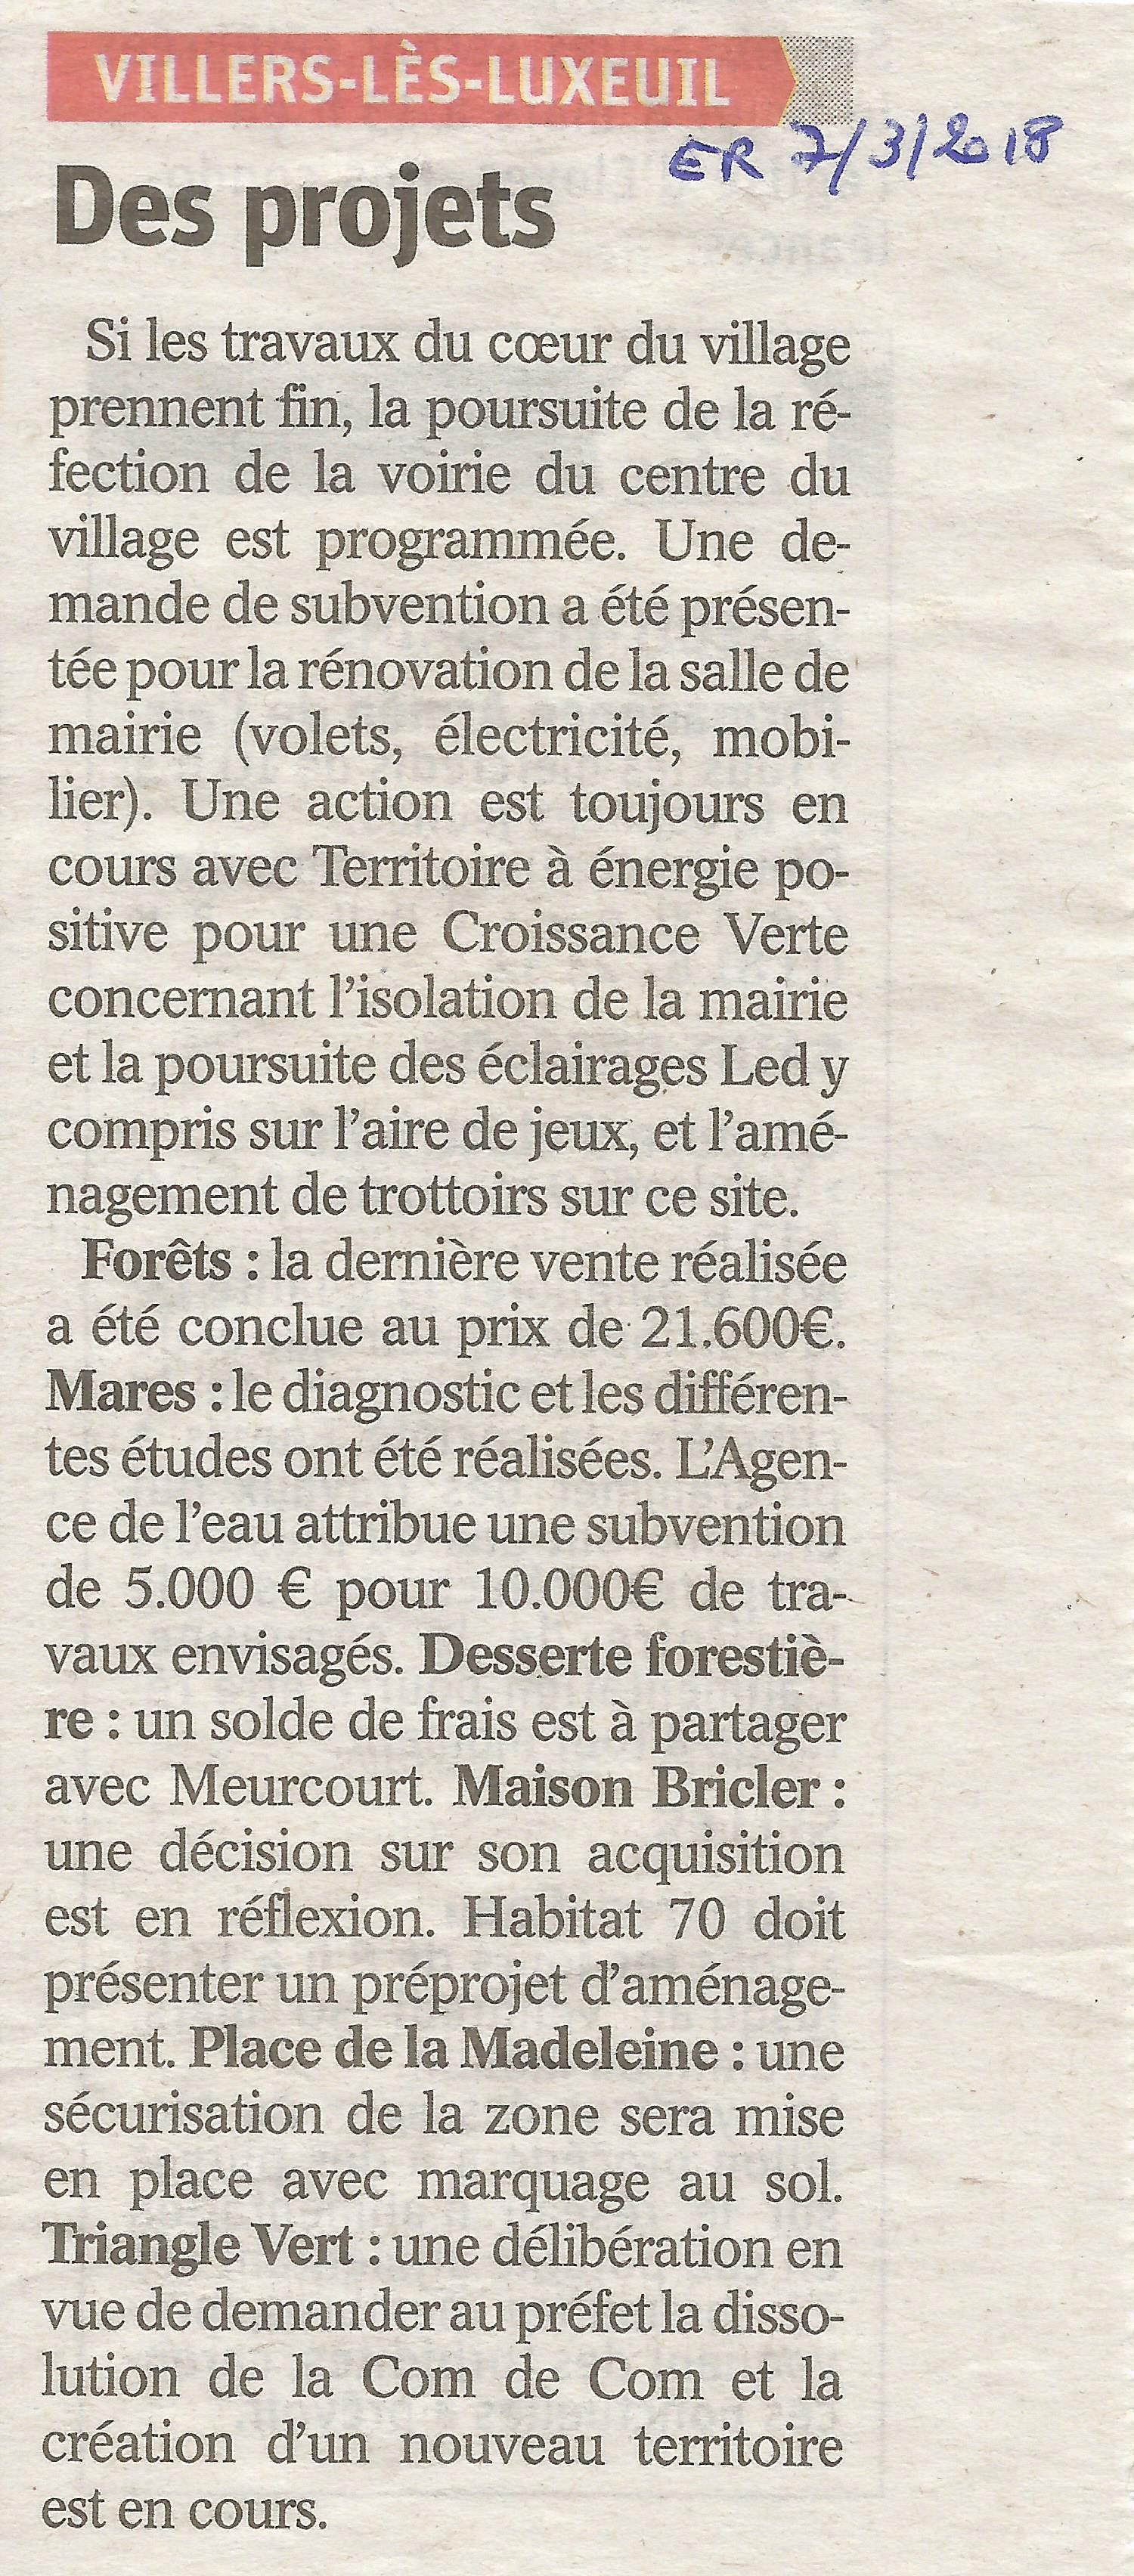 https://www.villers-les-luxeuil.com/projets/villers/files/images/2018_Mairie/Presse/2018_03_07.jpg